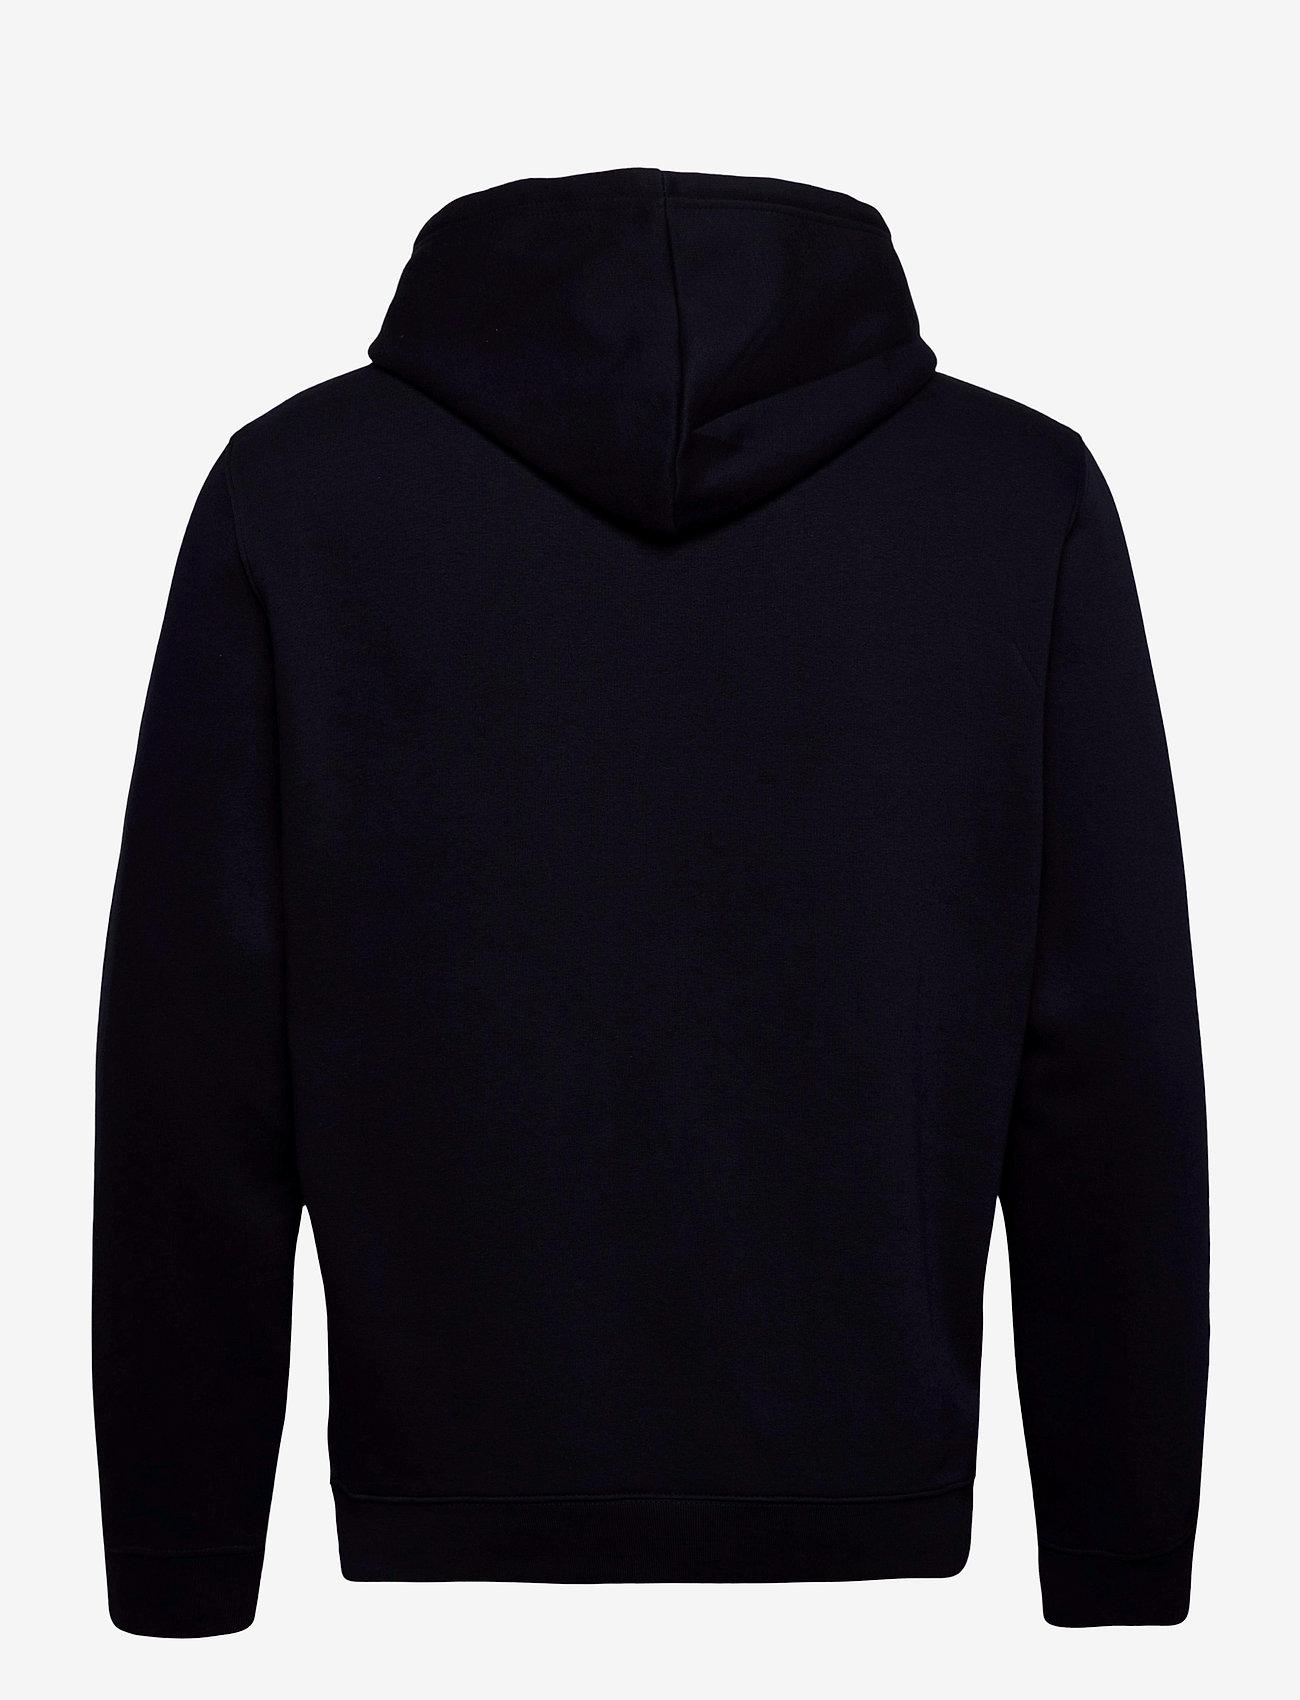 Champion Hooded Sweatshirt - Sweatshirts SKY CAPTAIN - Menn Klær